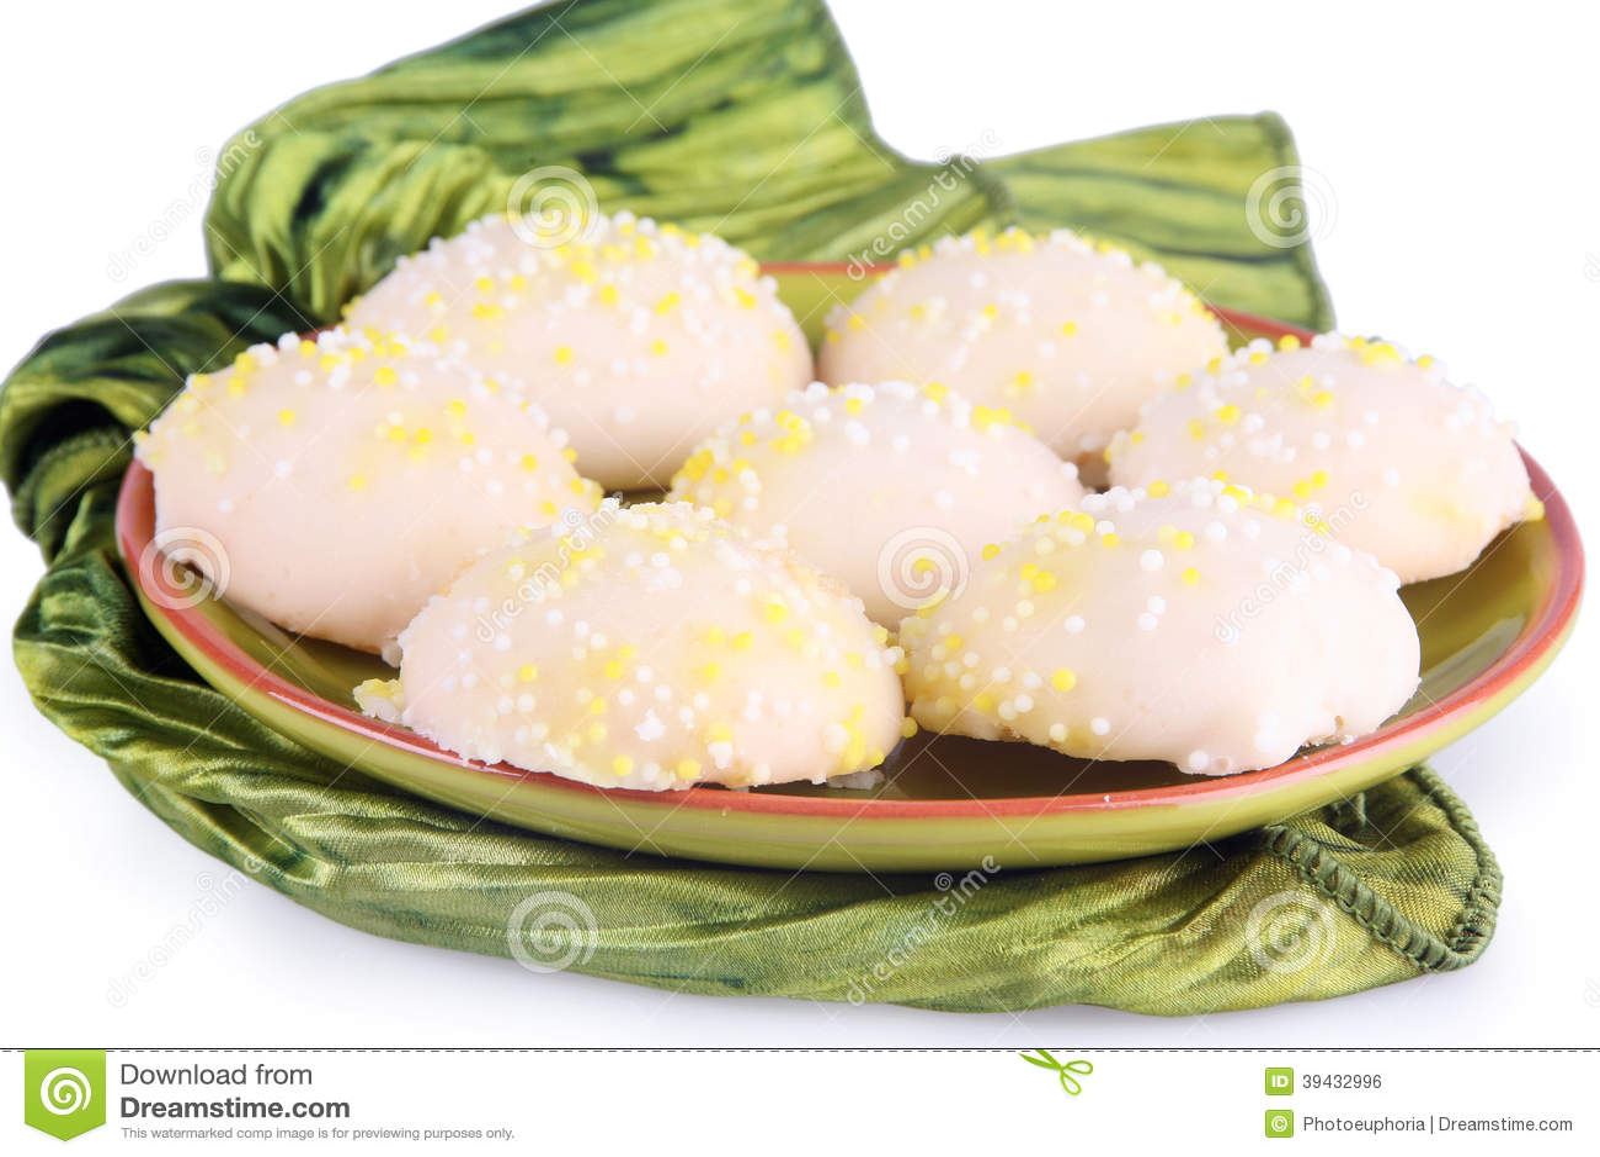 Anisette Cookies